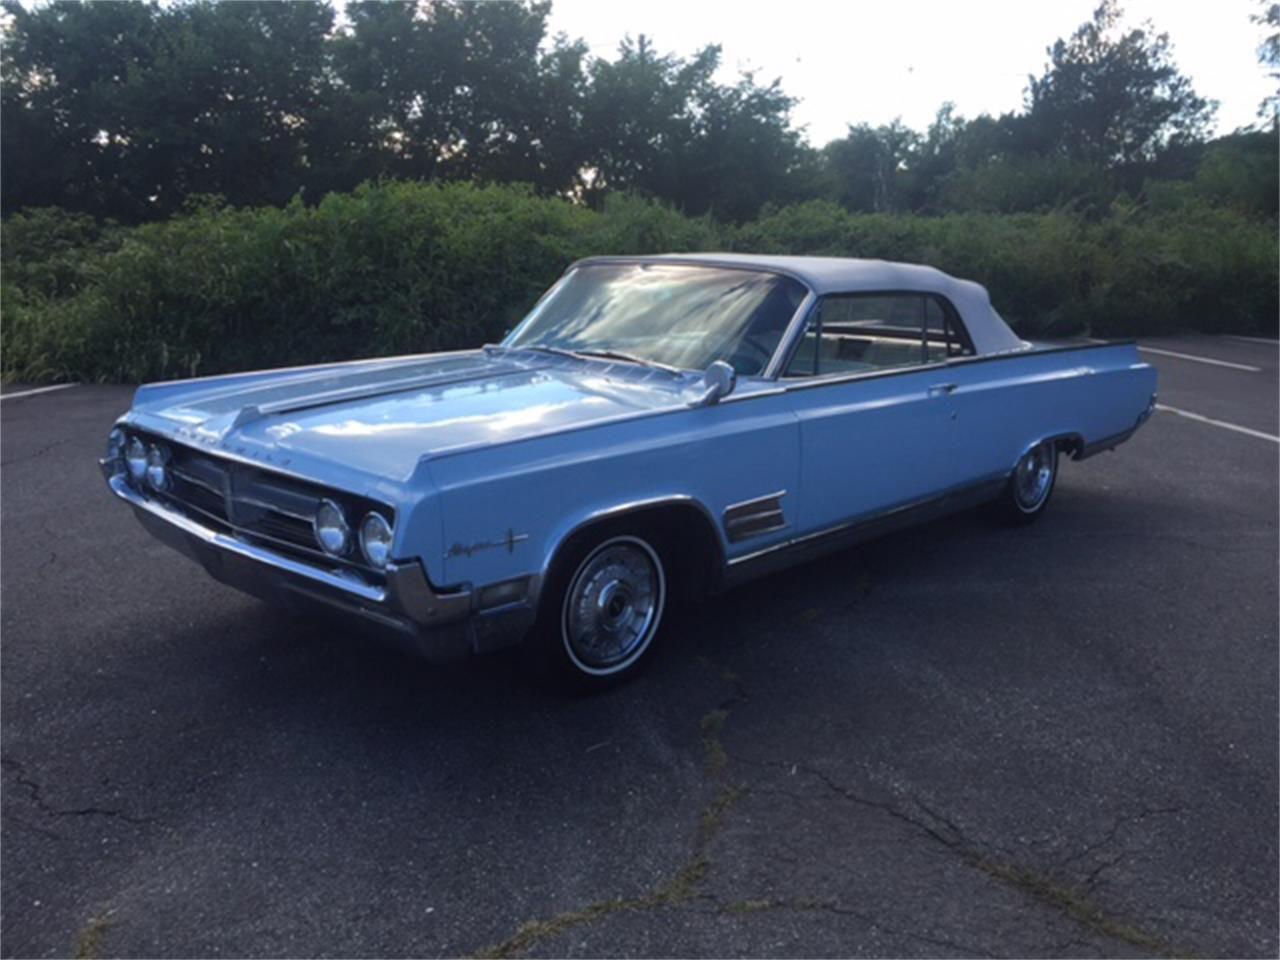 1964 Oldsmobile Starfire 88 | Oldsmobile | Pinterest